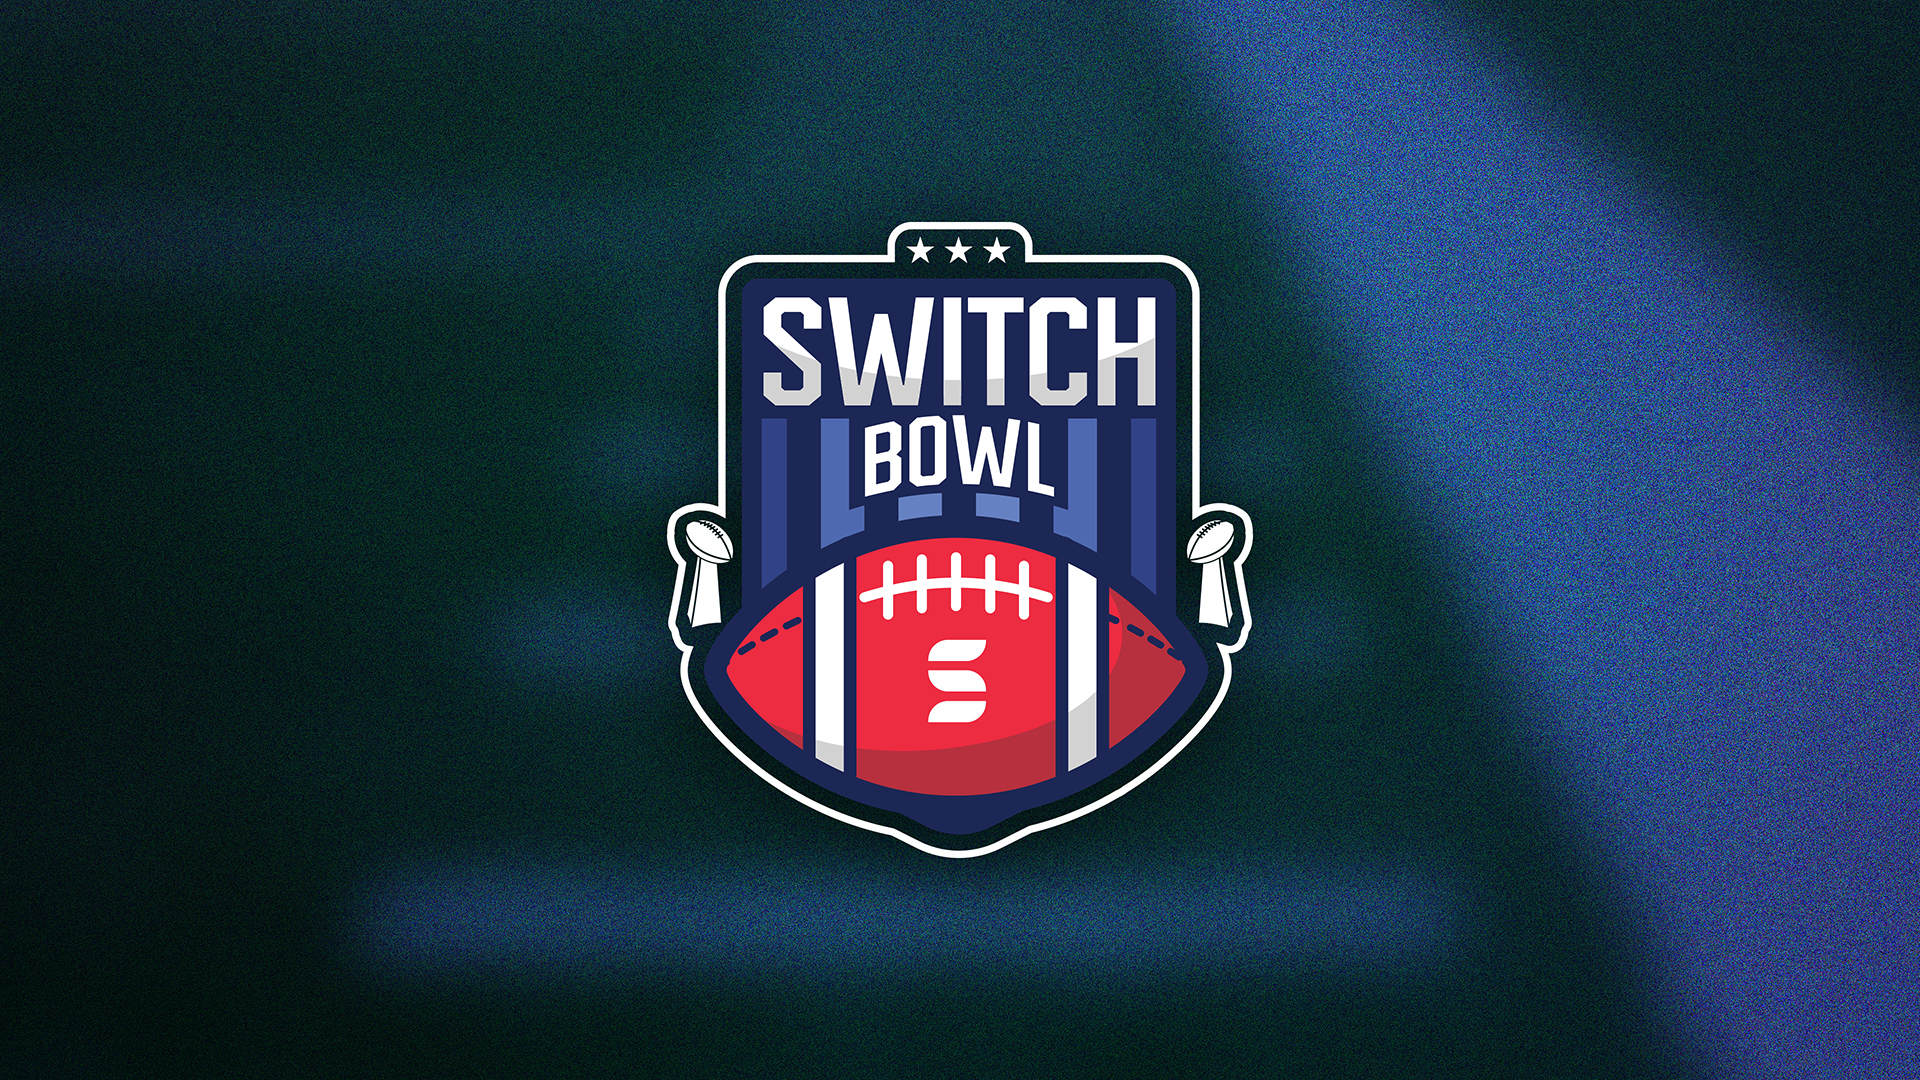 Switch Bowl (JPG)